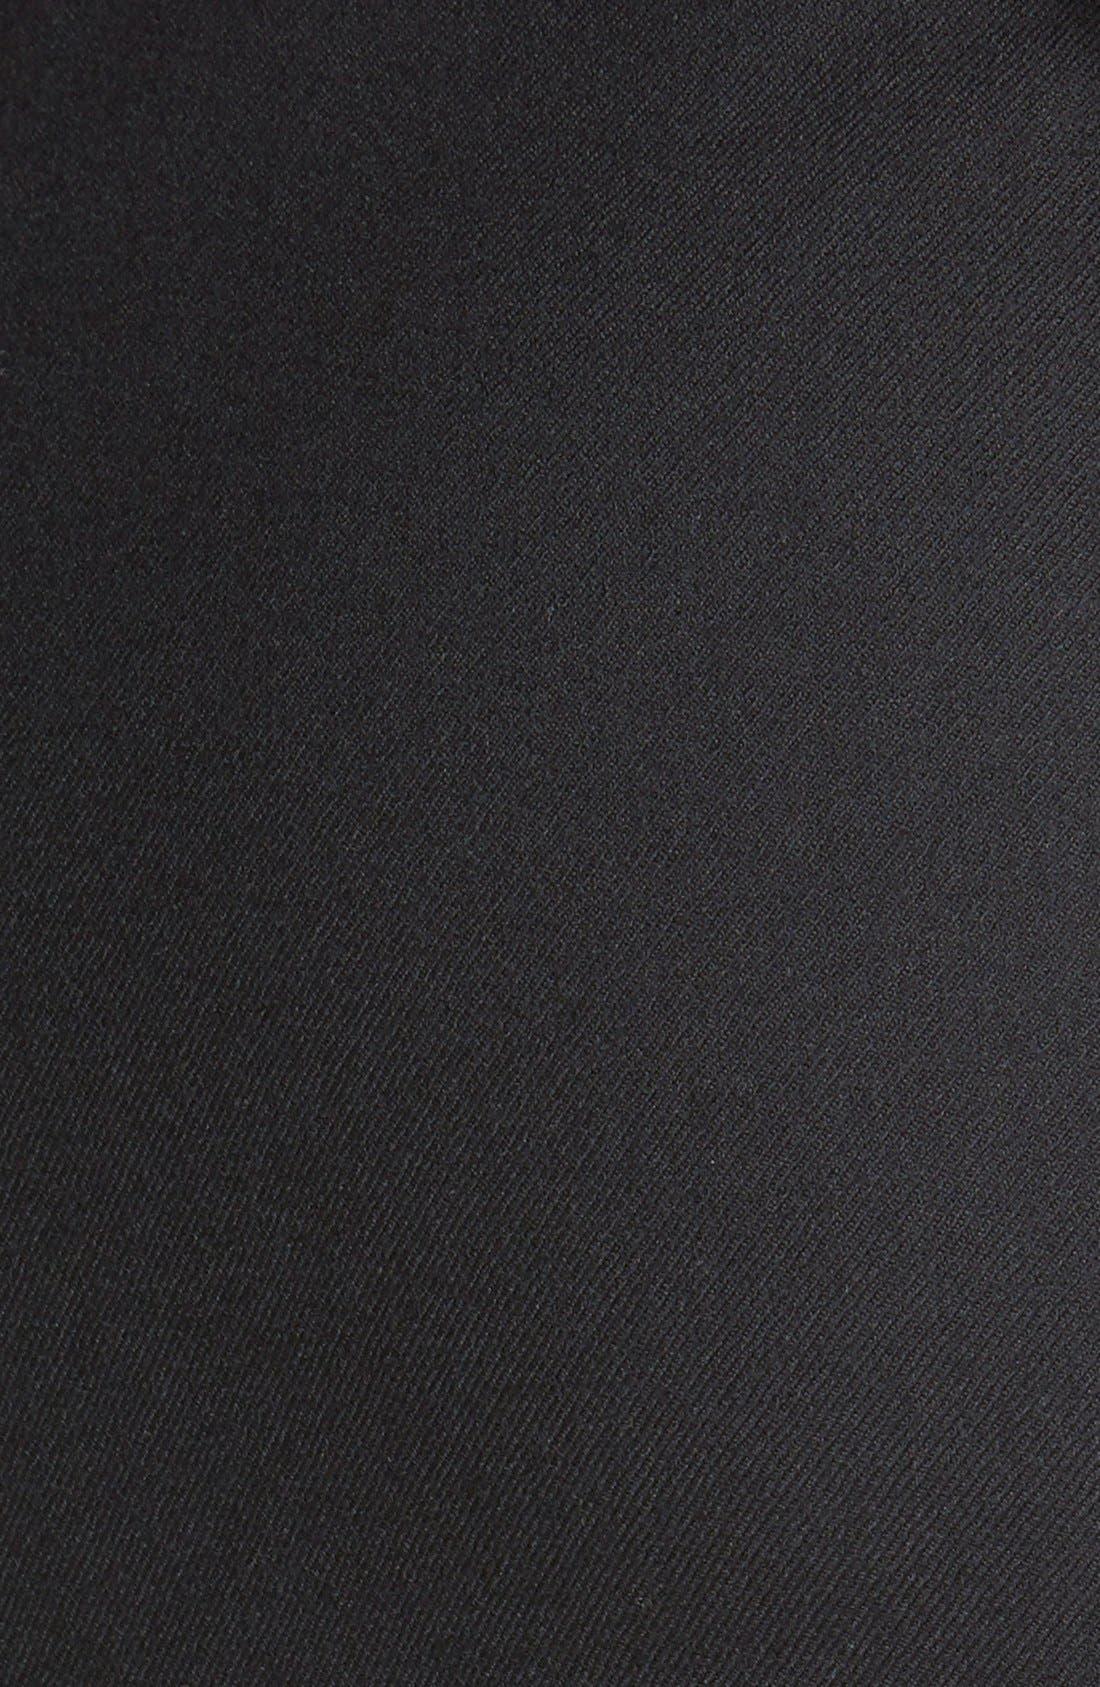 Alternate Image 3  - Elie Tahari 'Harla' Knit Skirt